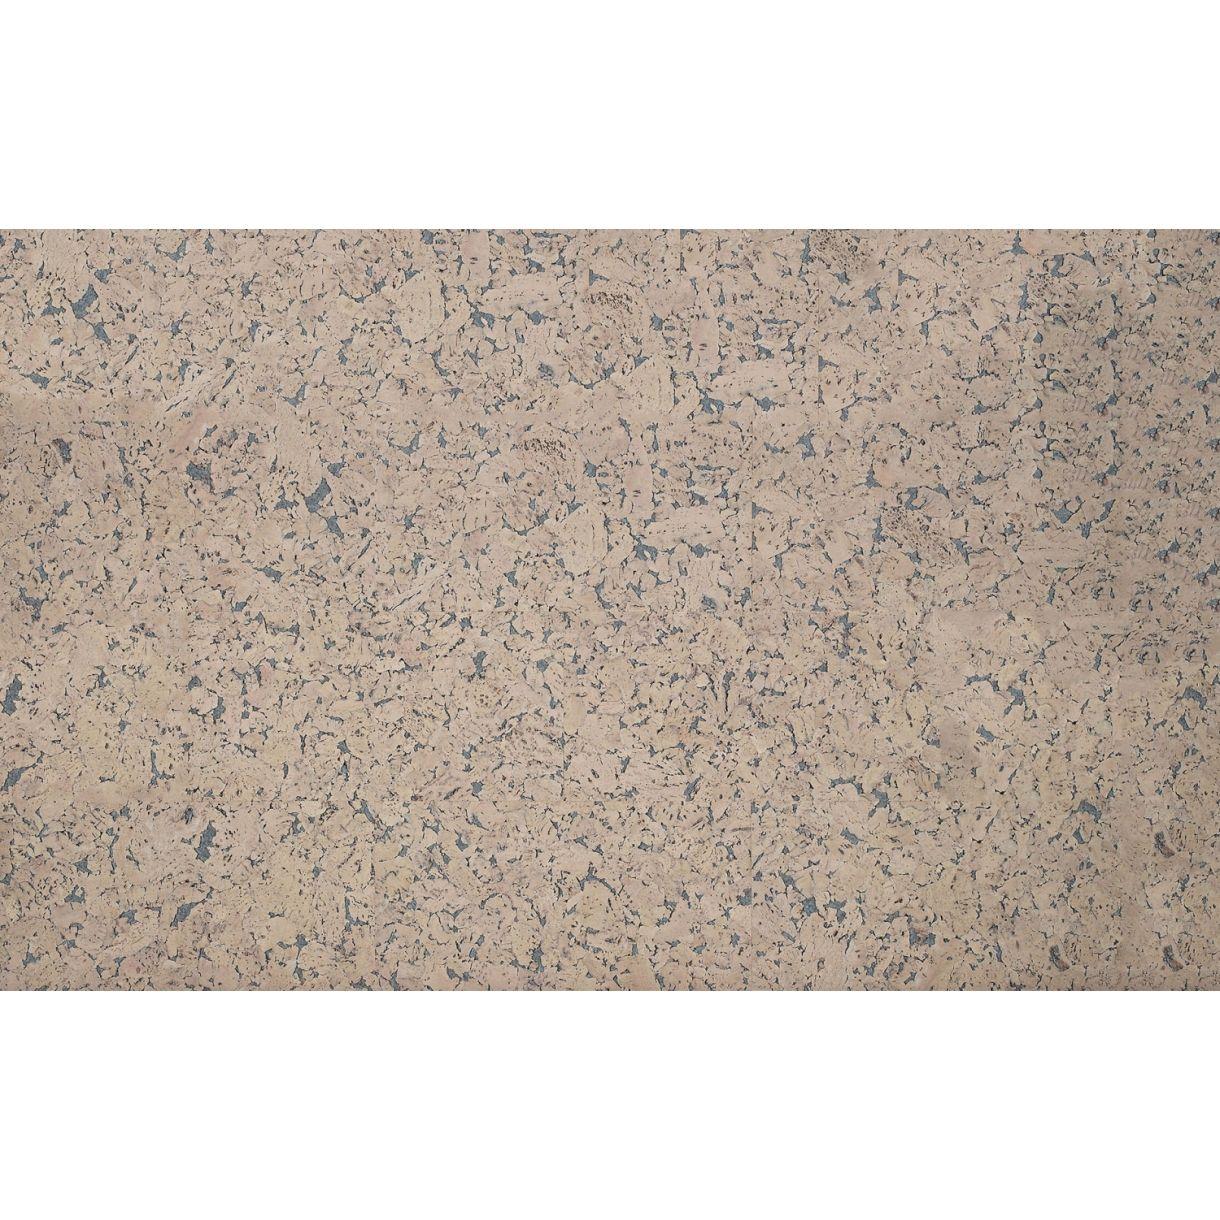 Decorative cork wall tiles HAWAI PEARL 3x300x600mm - package 1,98 ...